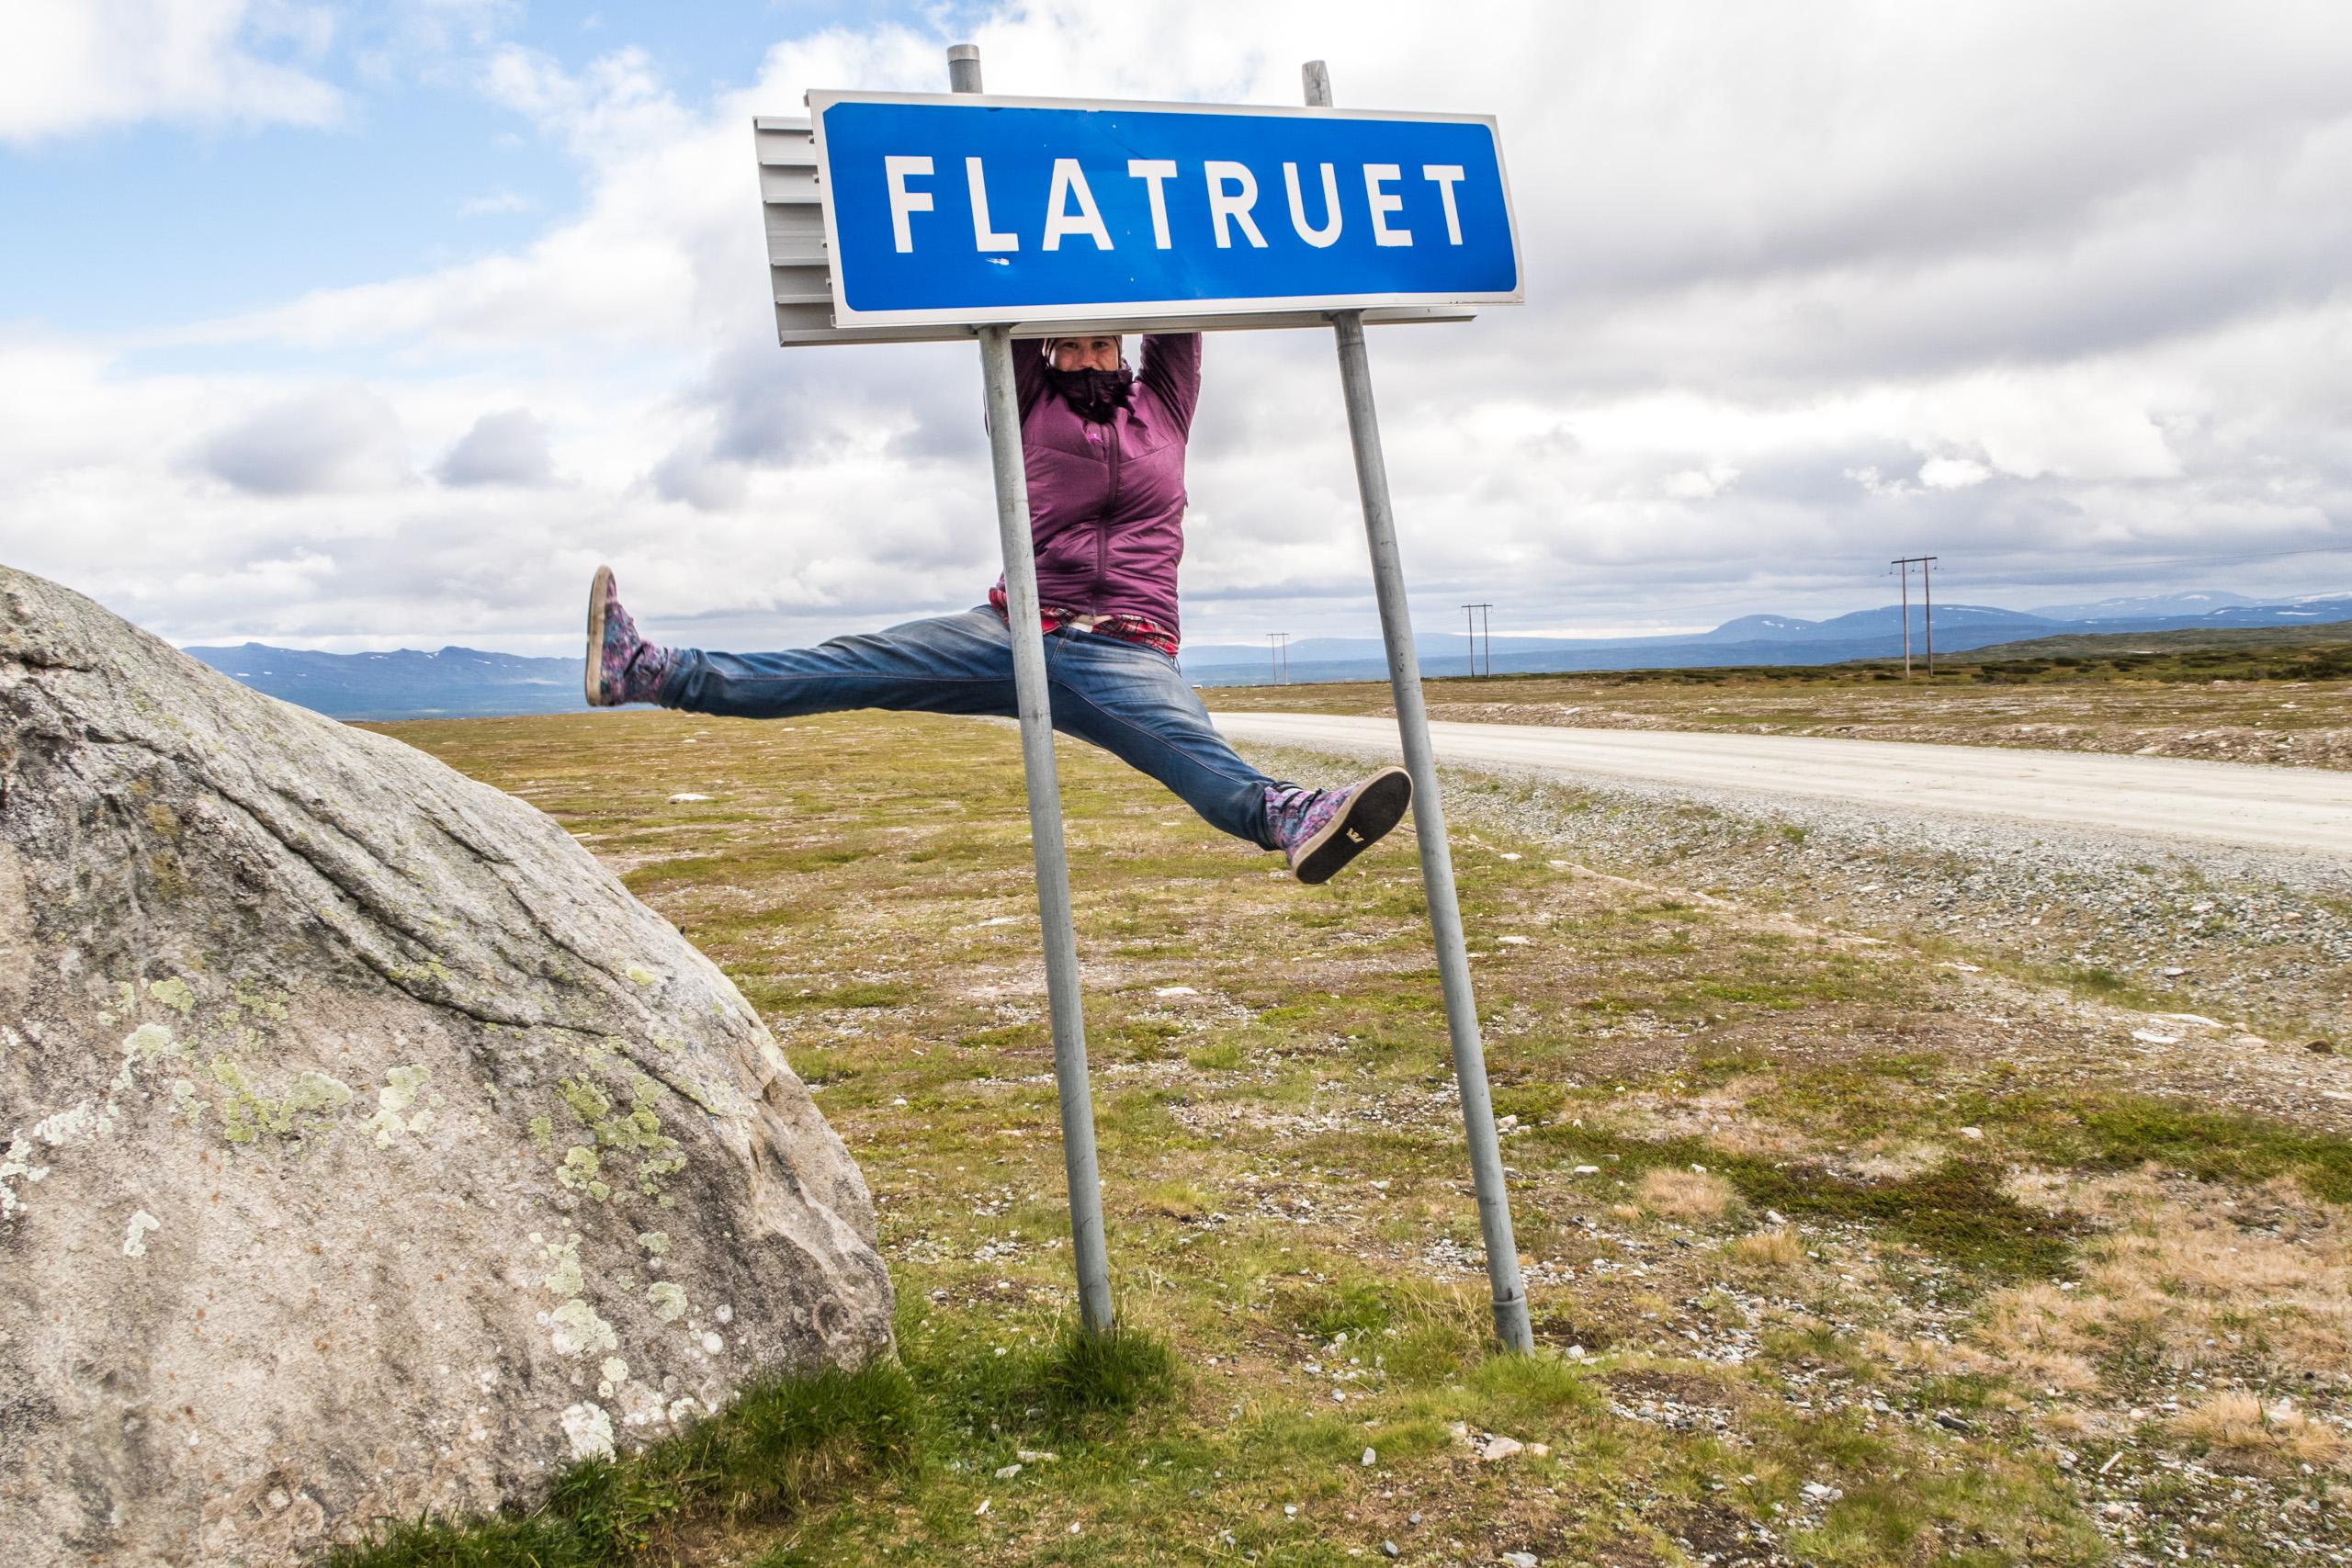 Flatruet